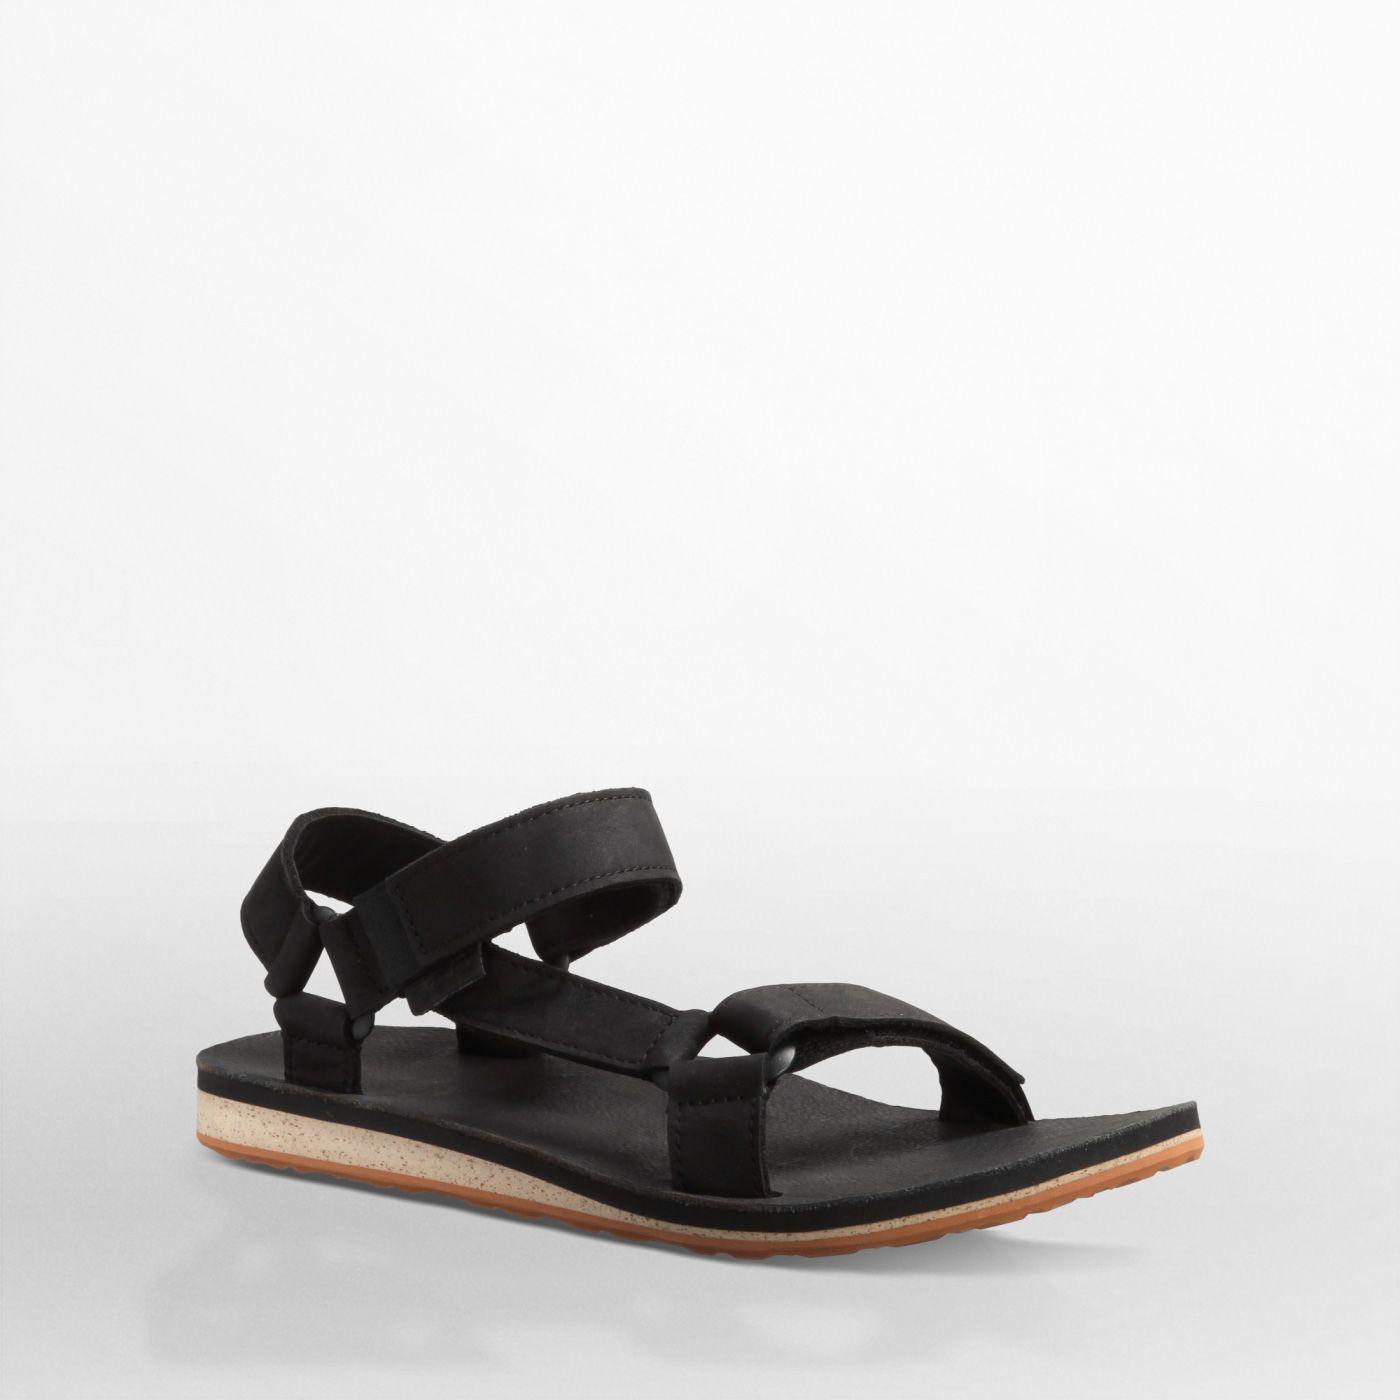 1d59690b3d37 Teva® Original Universal Premium Leather Sandals for Men